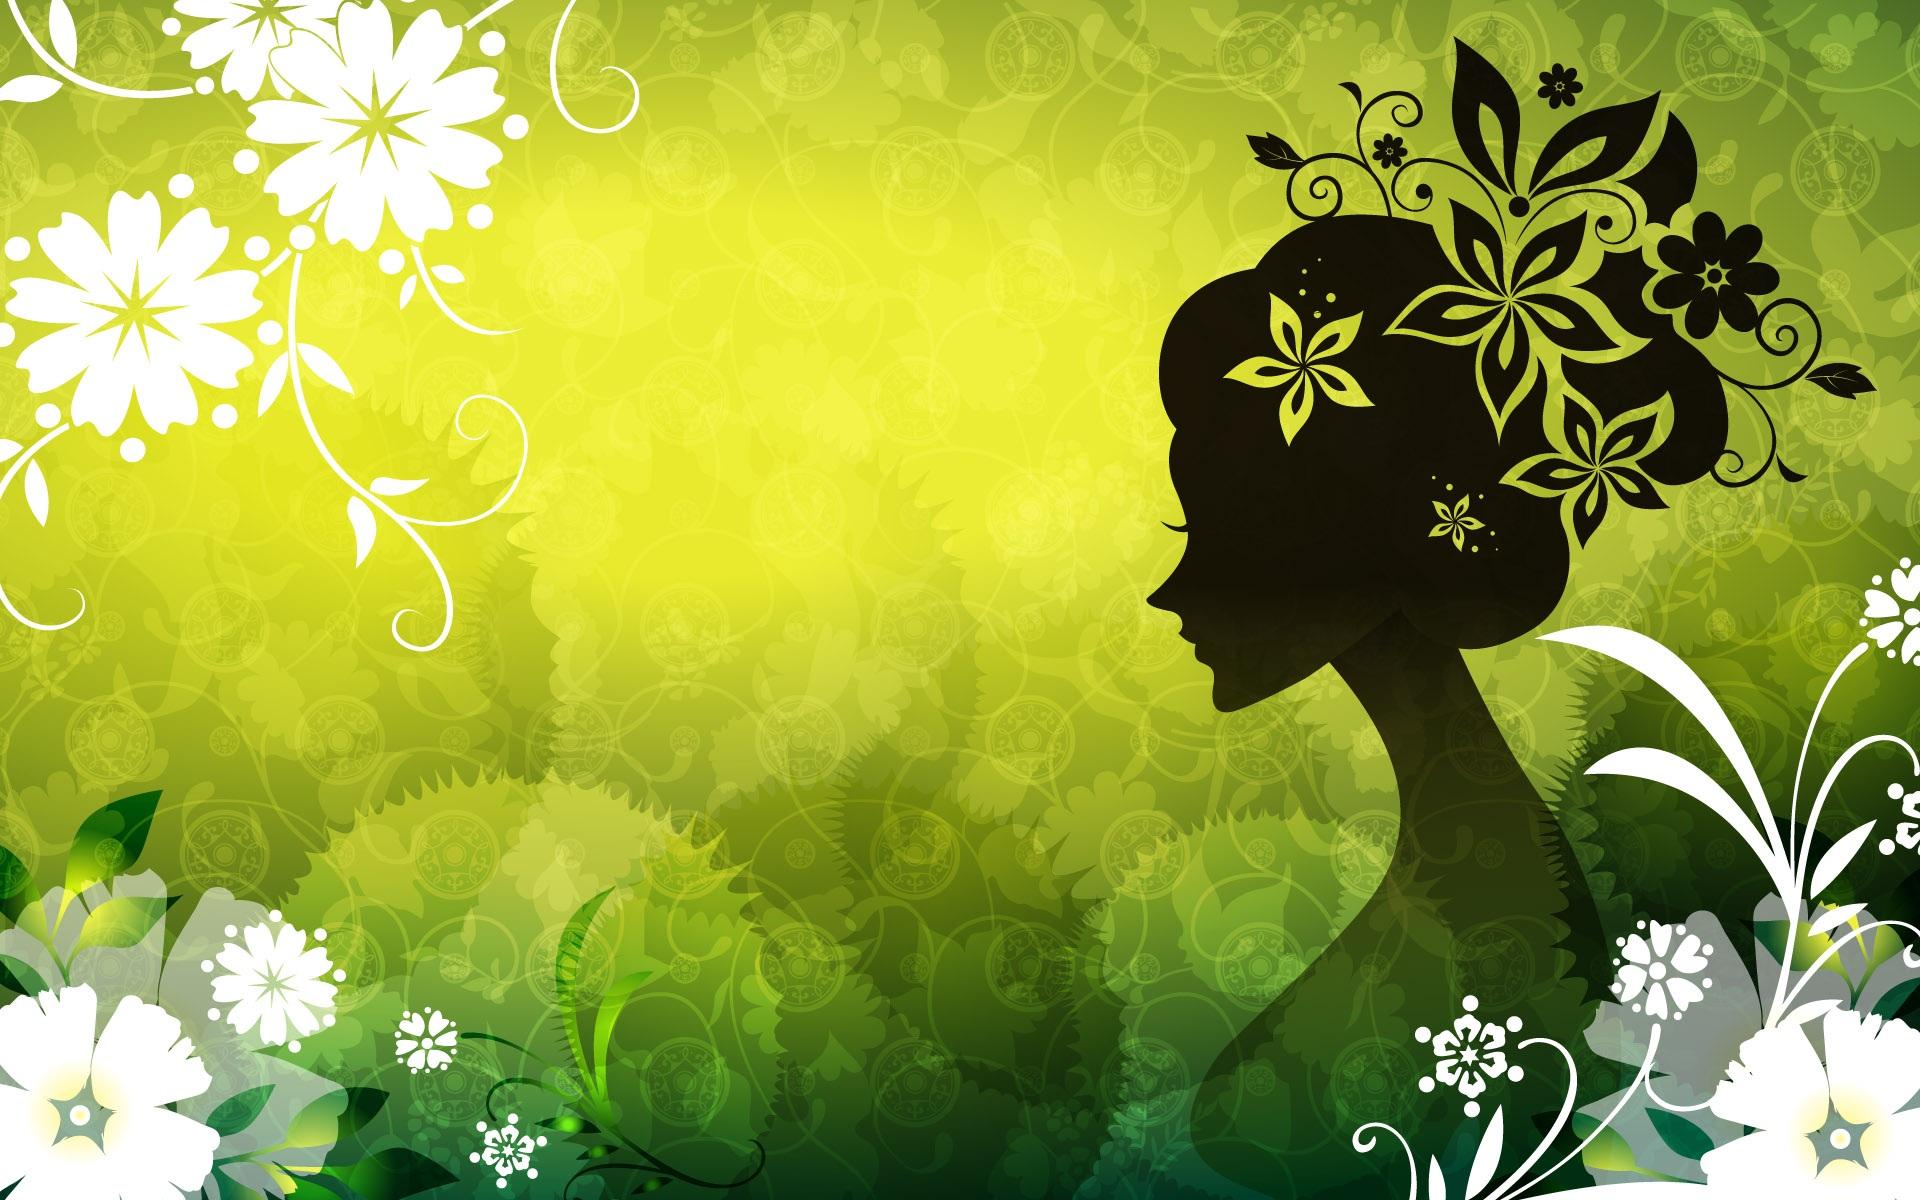 Wallpaper Vector Women Green Flowers 1920x1200 HD Picture Image